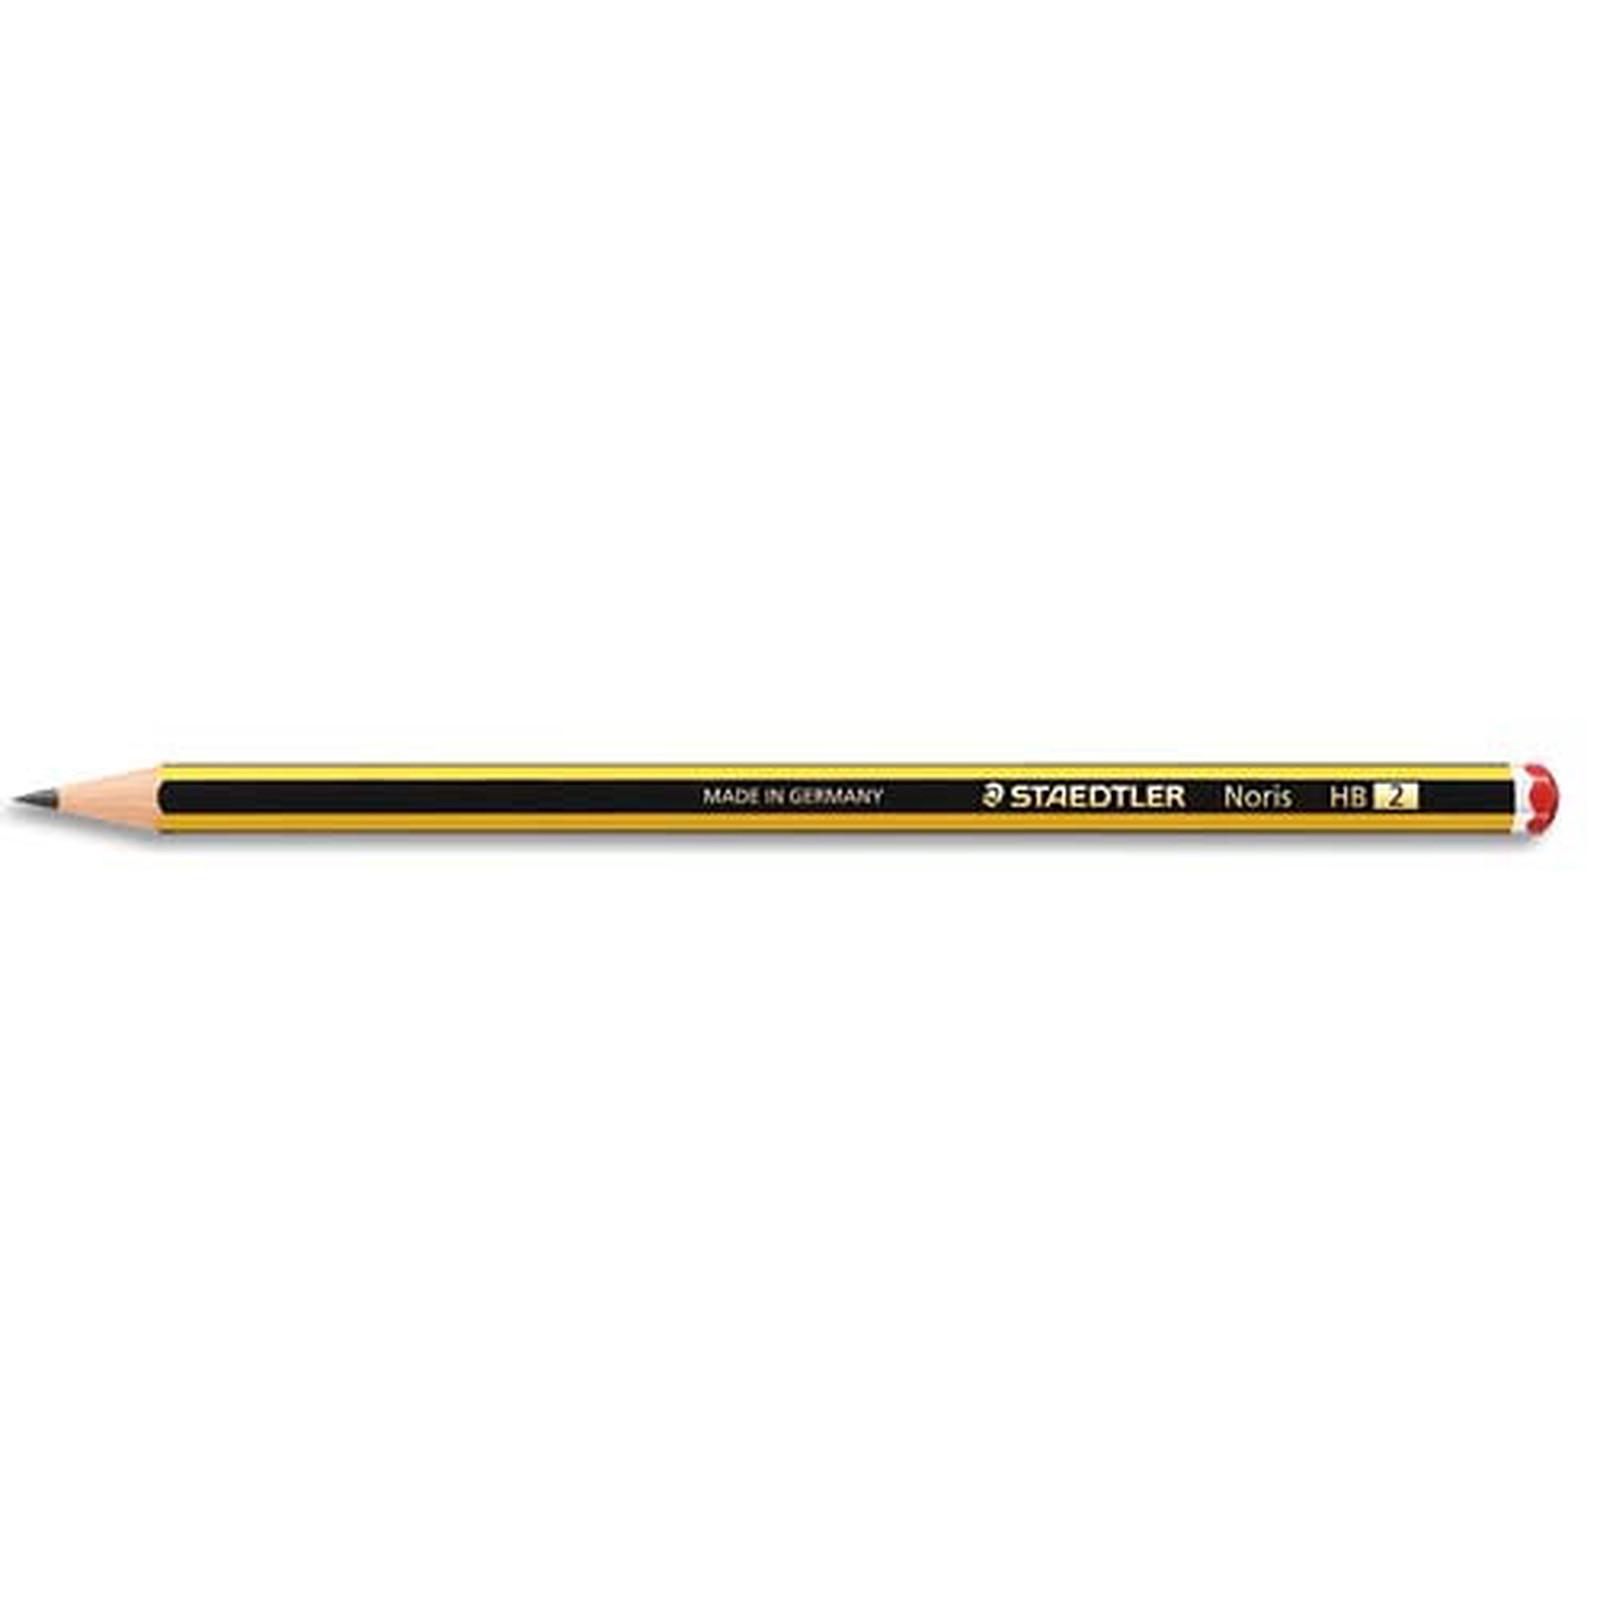 STAEDTLER Crayon Noris HB 120-2